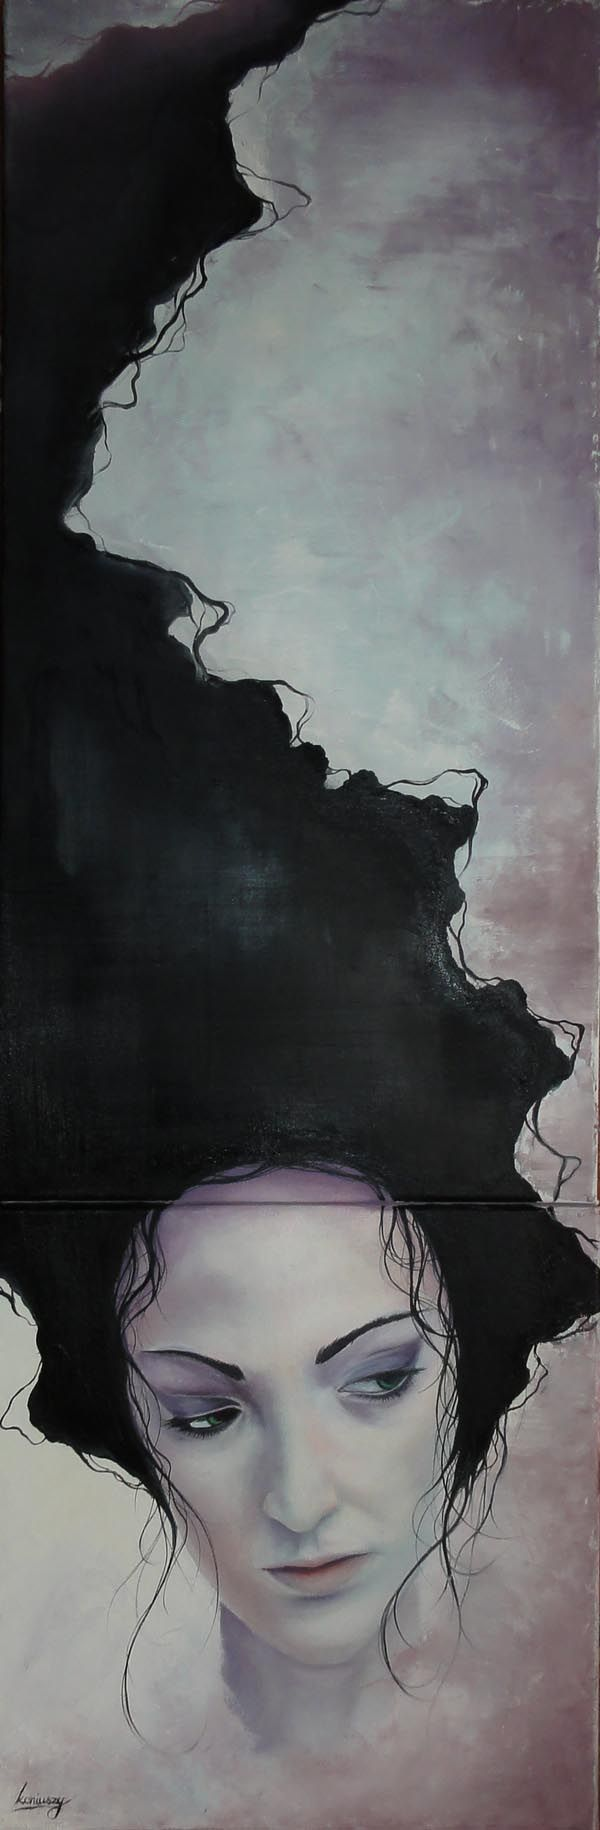 Violeta - Oil on Canvas Painting by Łukasz Koniuszy